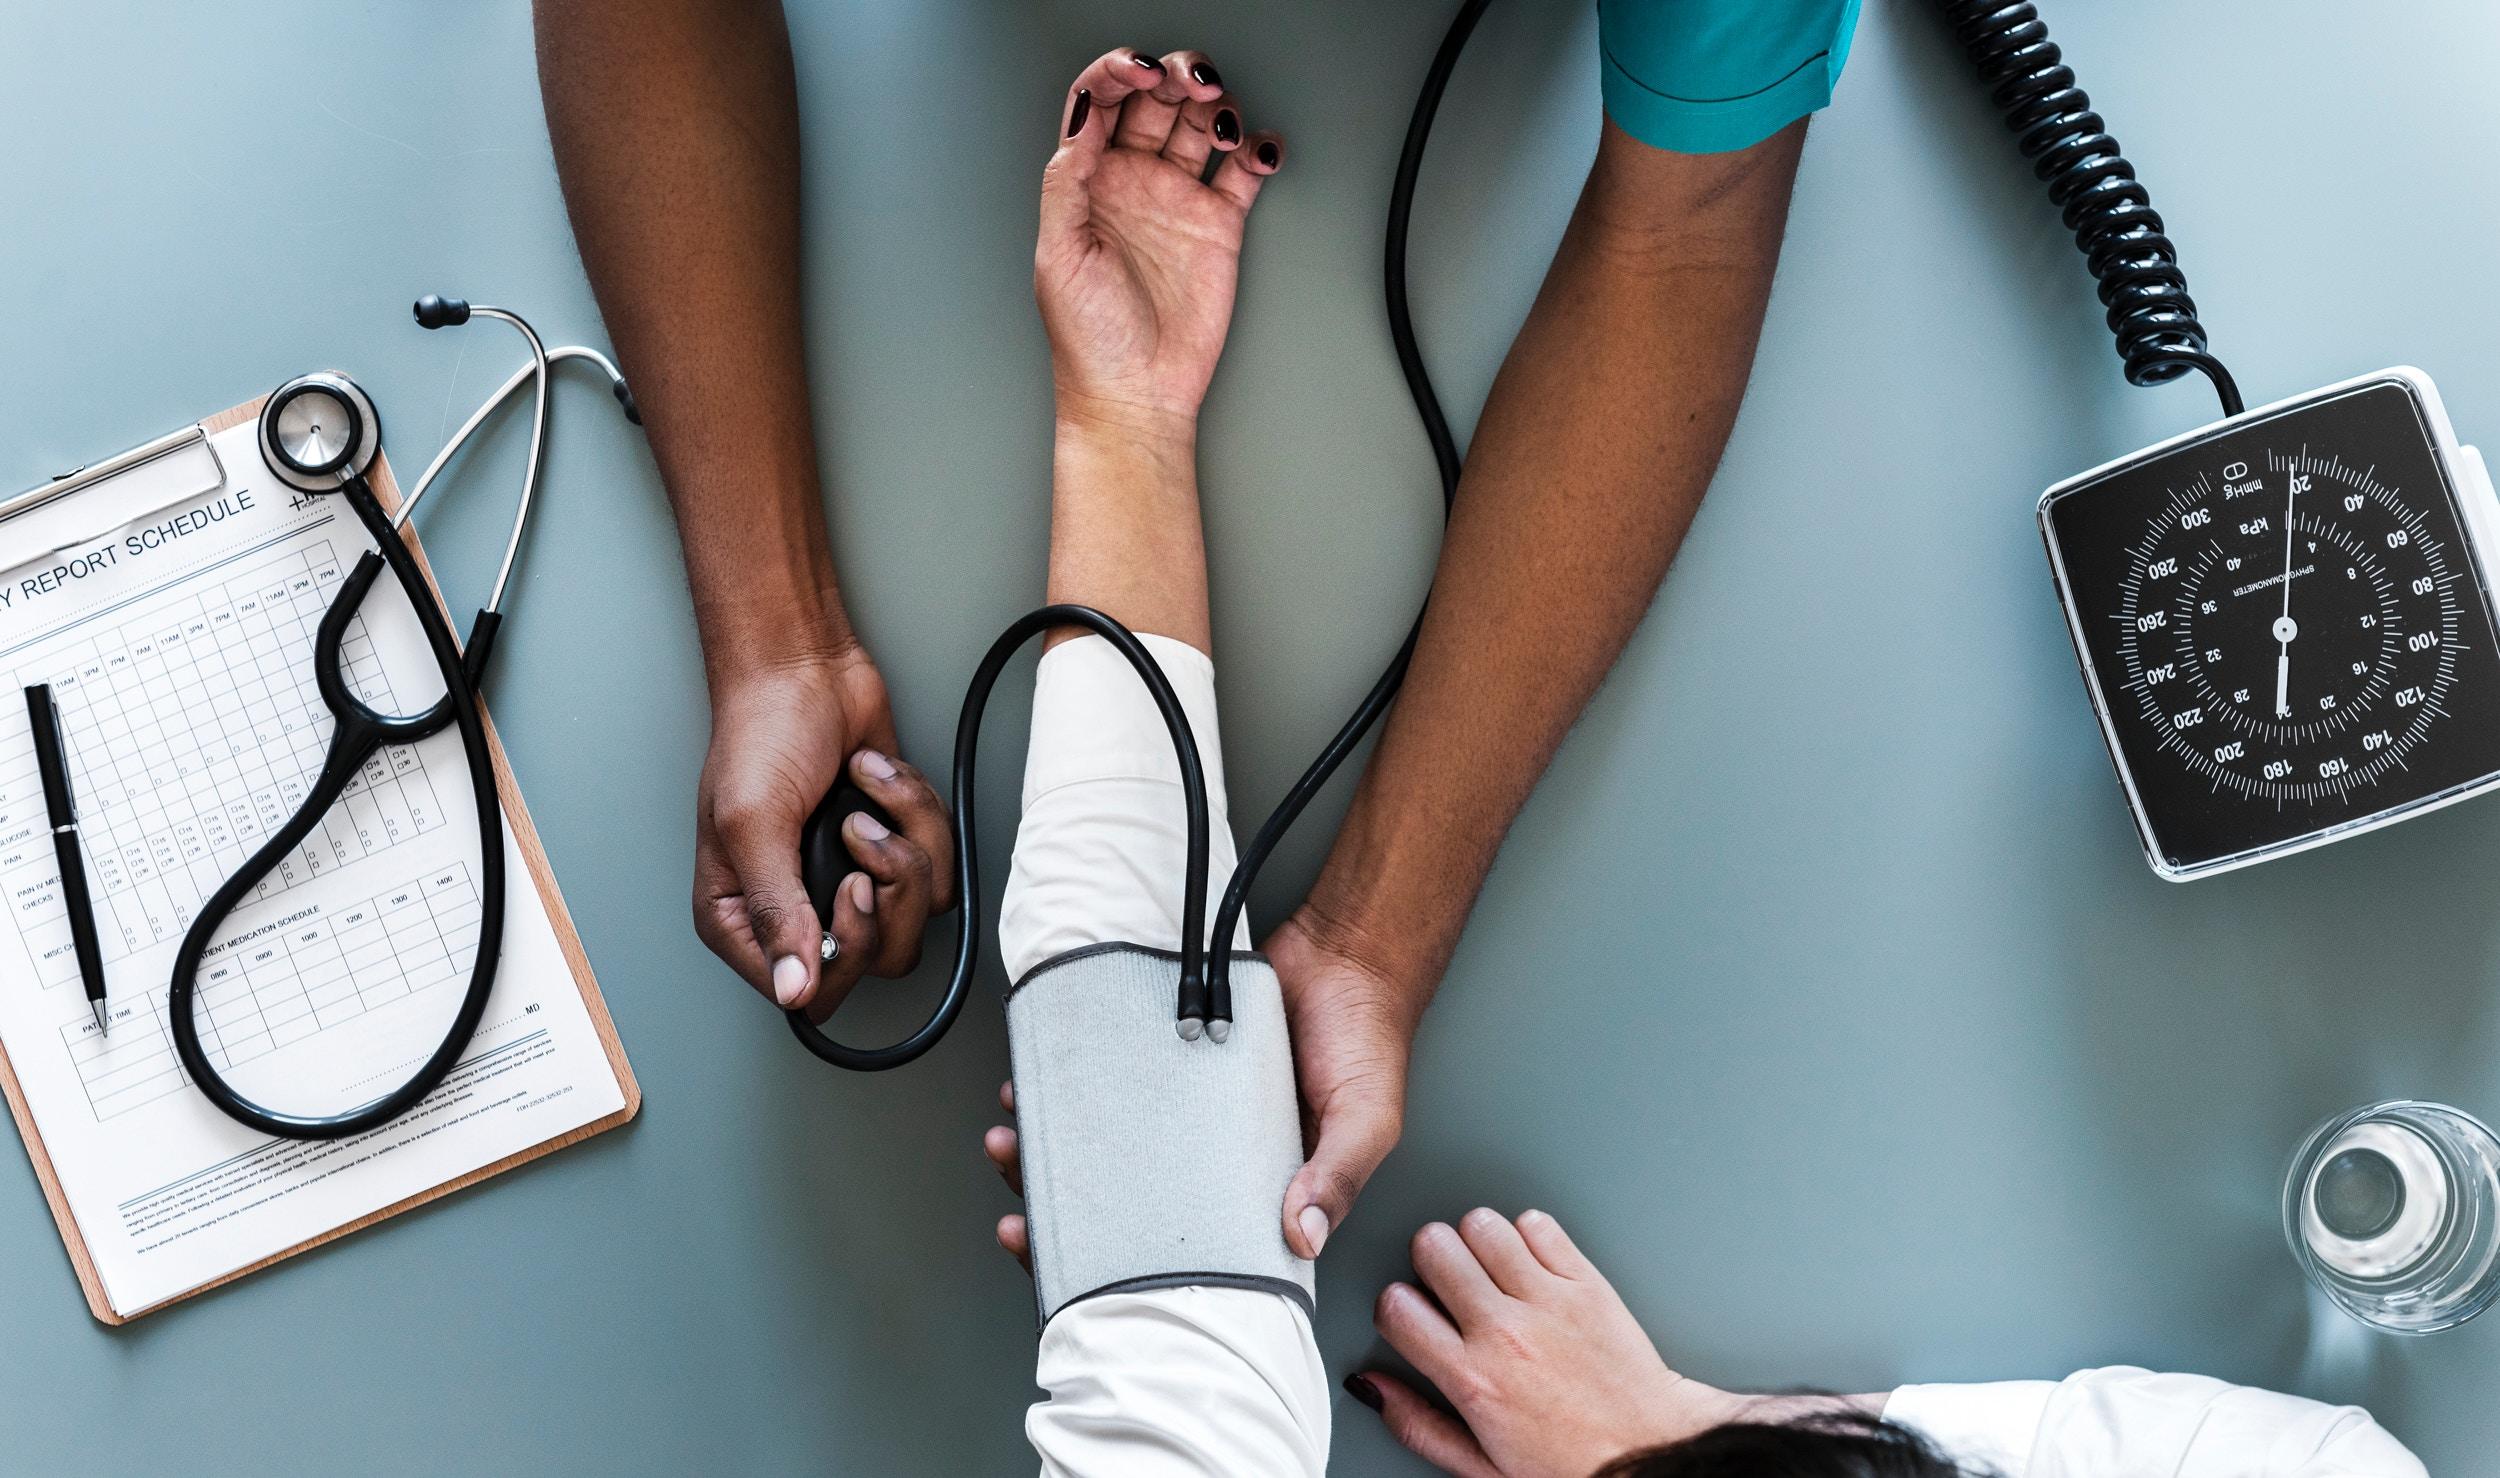 bras-medecin-patient-medical